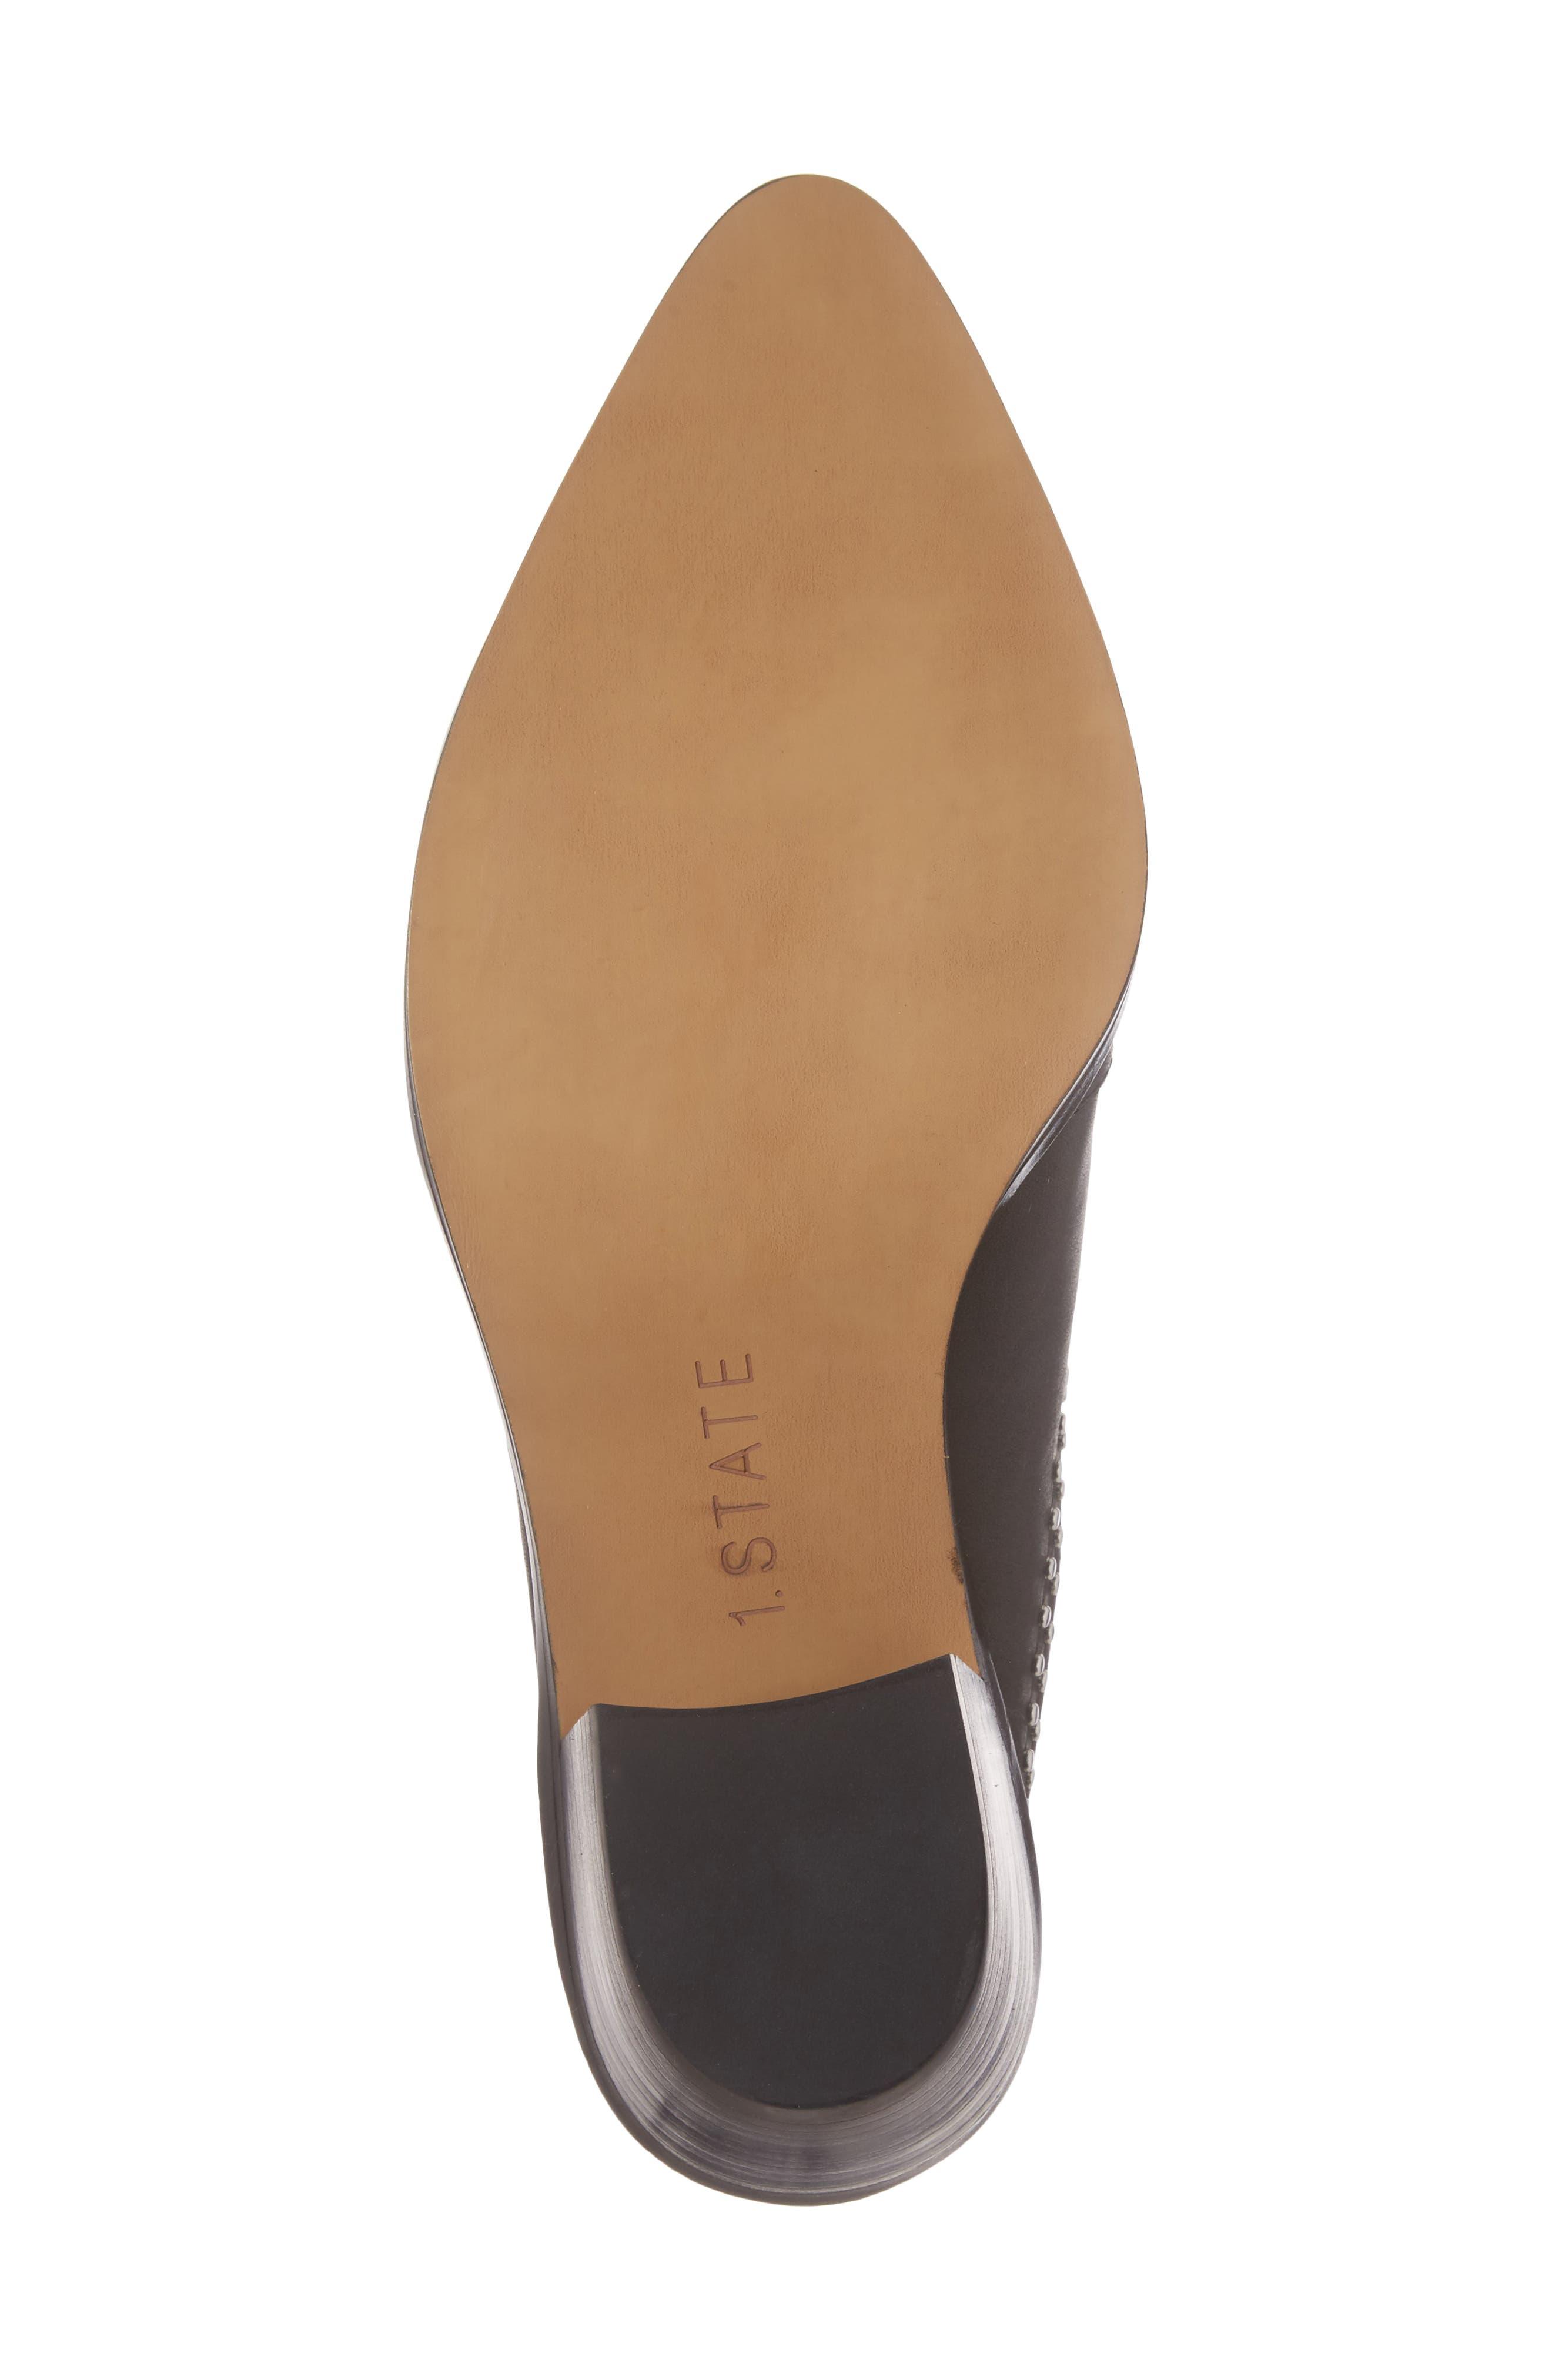 Lon Studded Loafer Mule,                             Alternate thumbnail 6, color,                             Black Leather